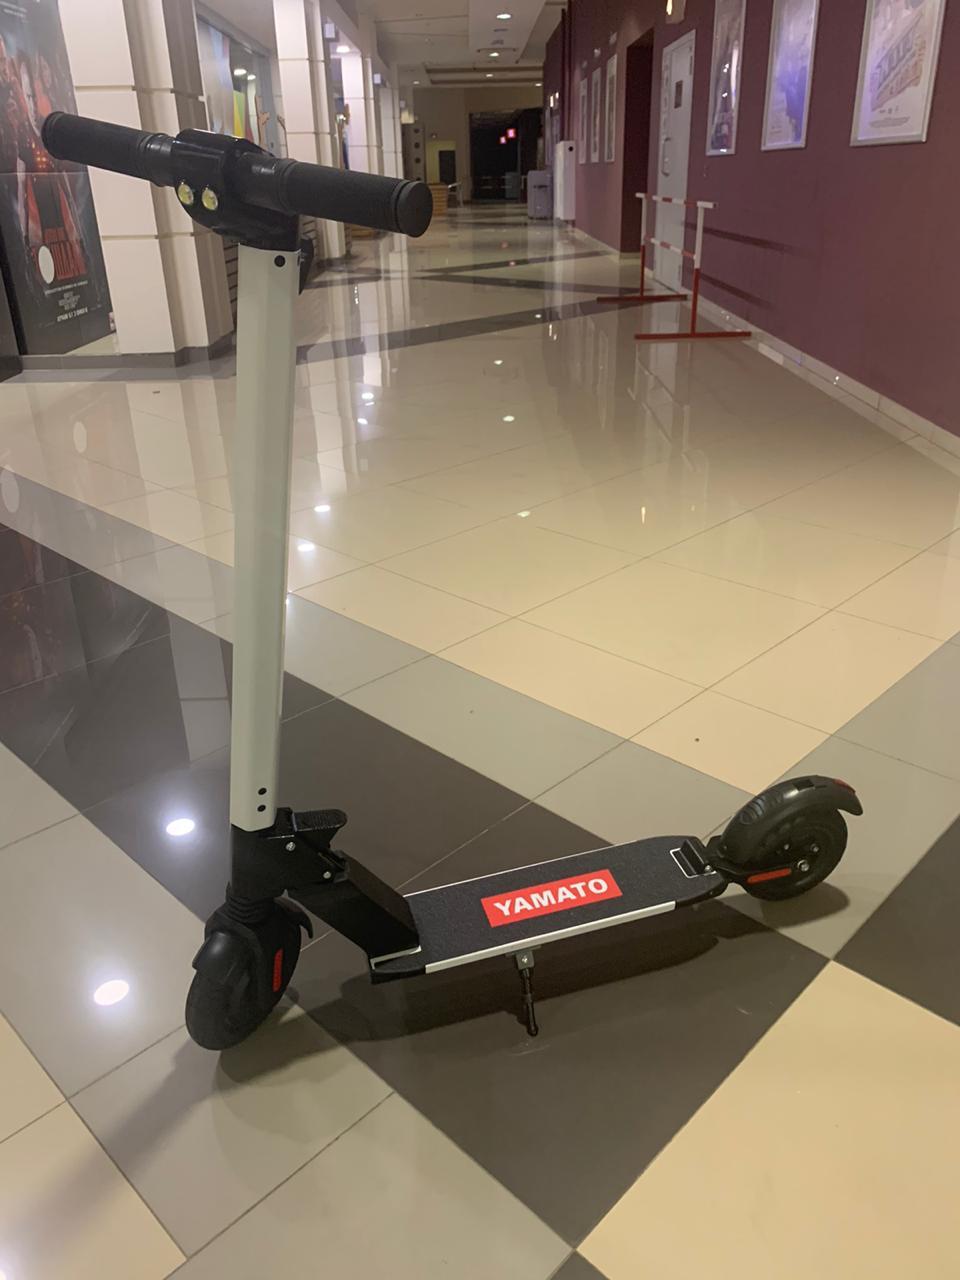 https://igiroskuter.ru/images/upload/2%20Электросамокат%20Yamato%20E-Scooter%20белый.jpeg